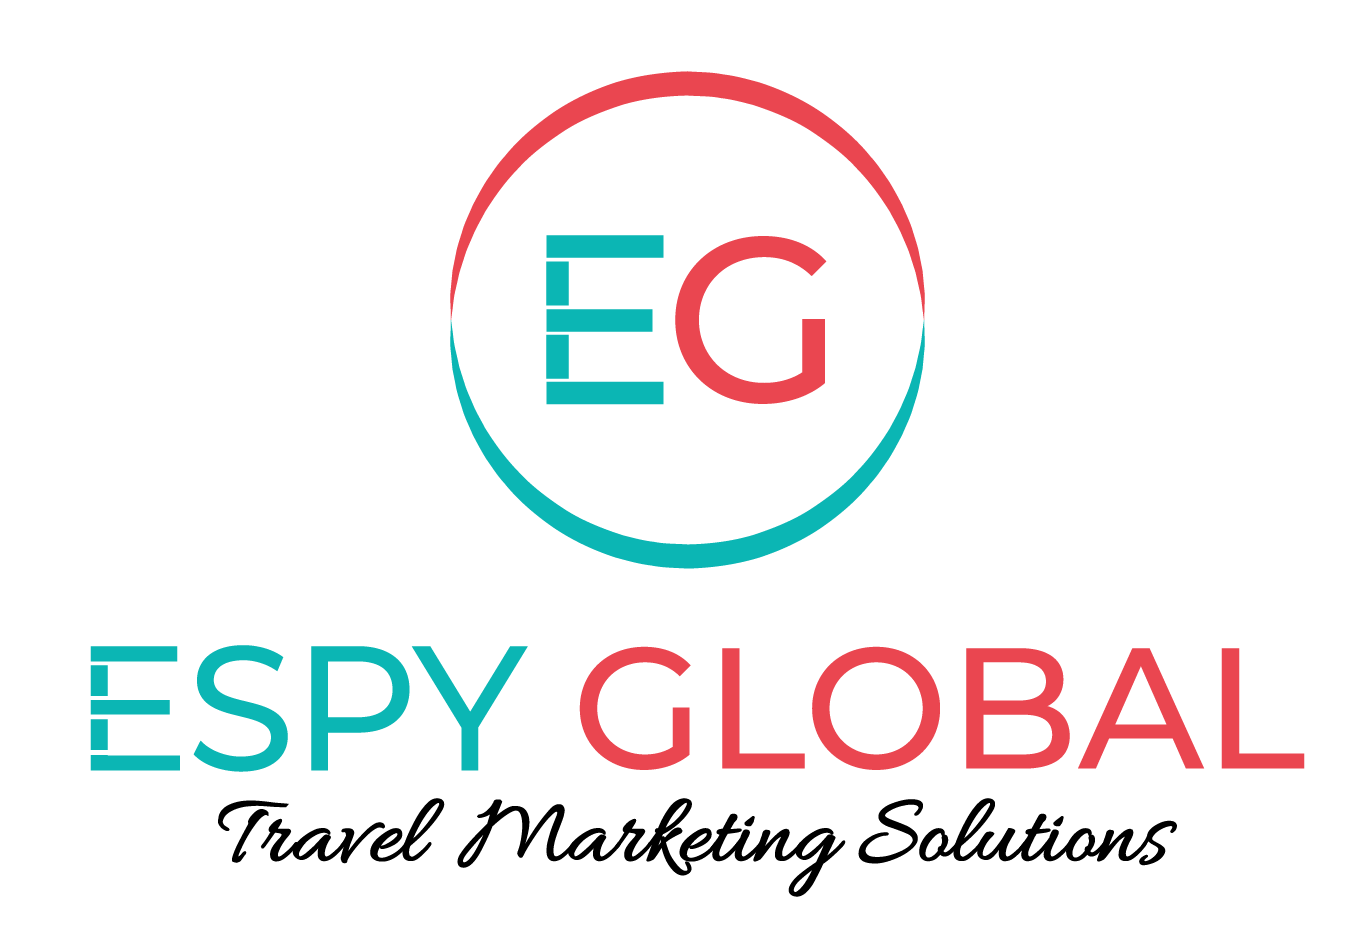 Espy Global Logo-01.png